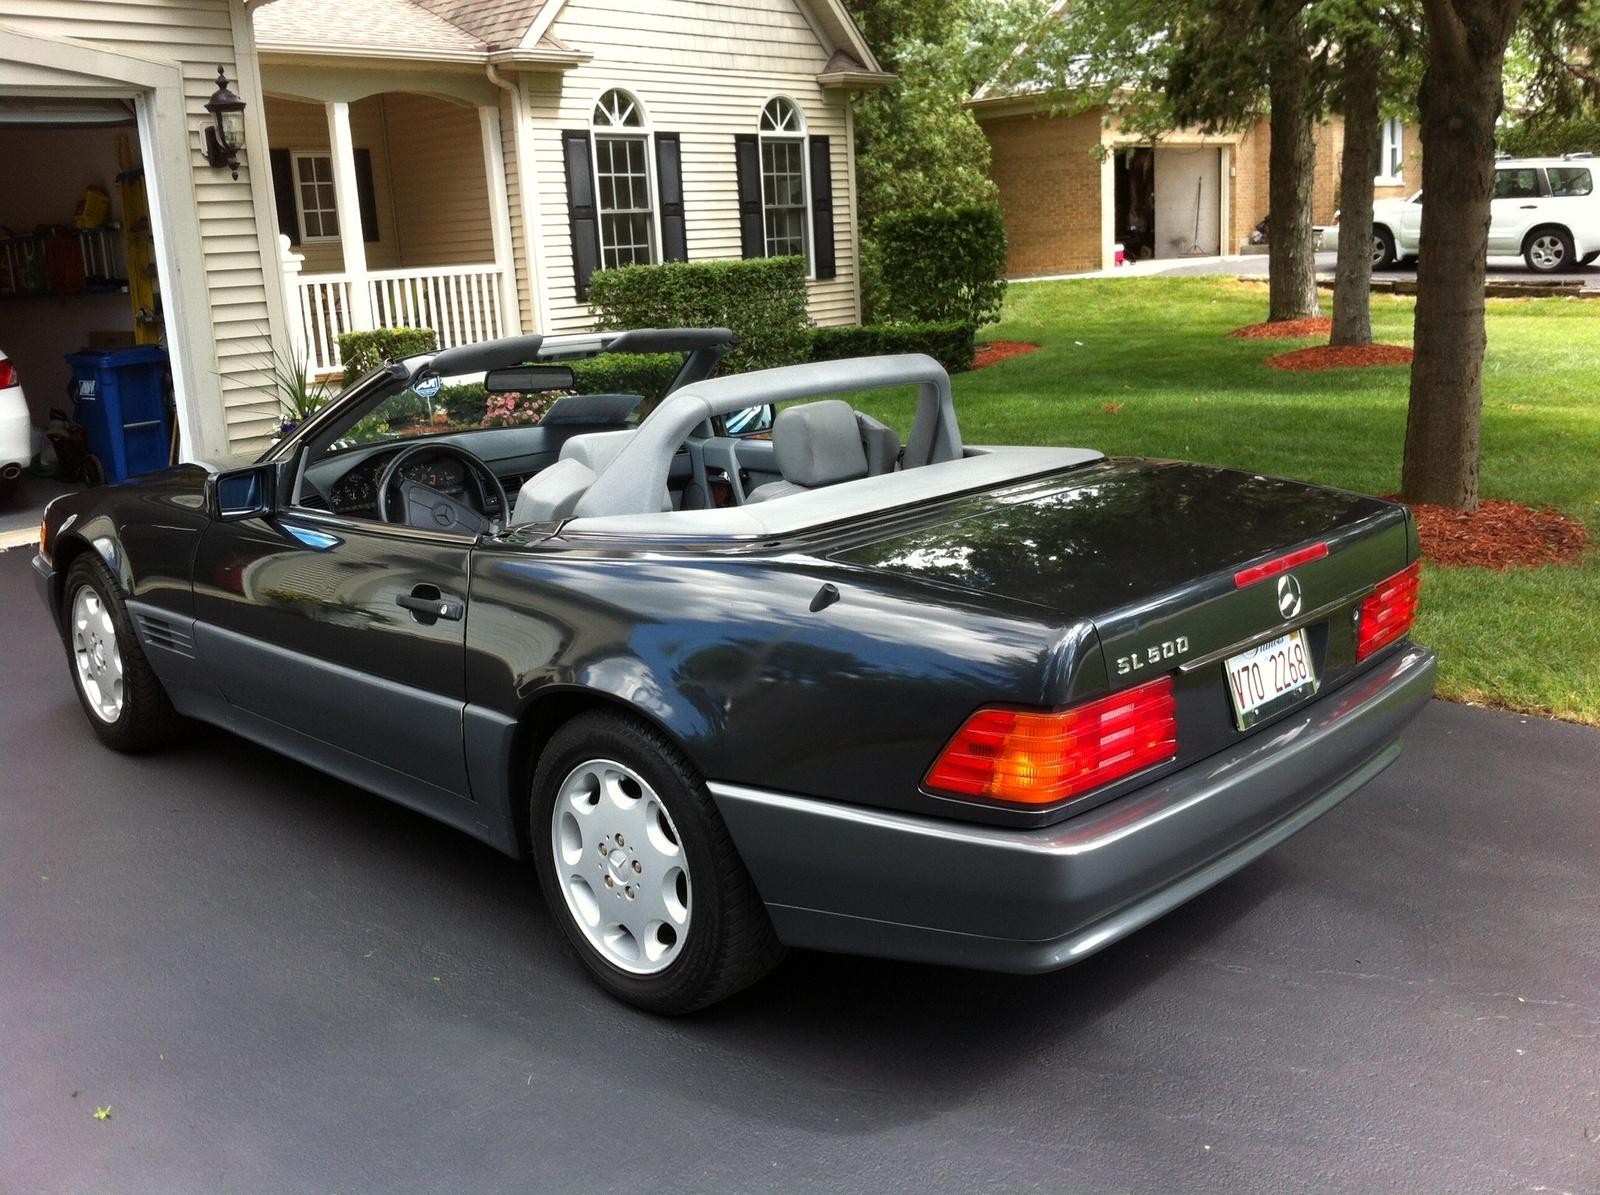 191098489044 moreover  likewise 2083 gielda Klasykow Wyprzedaz Kolekcji Johna Scottiego 8 besides Mercedes Sl 500 Price additionally Sl500tops. on 2000 mercedes sl600 convertible